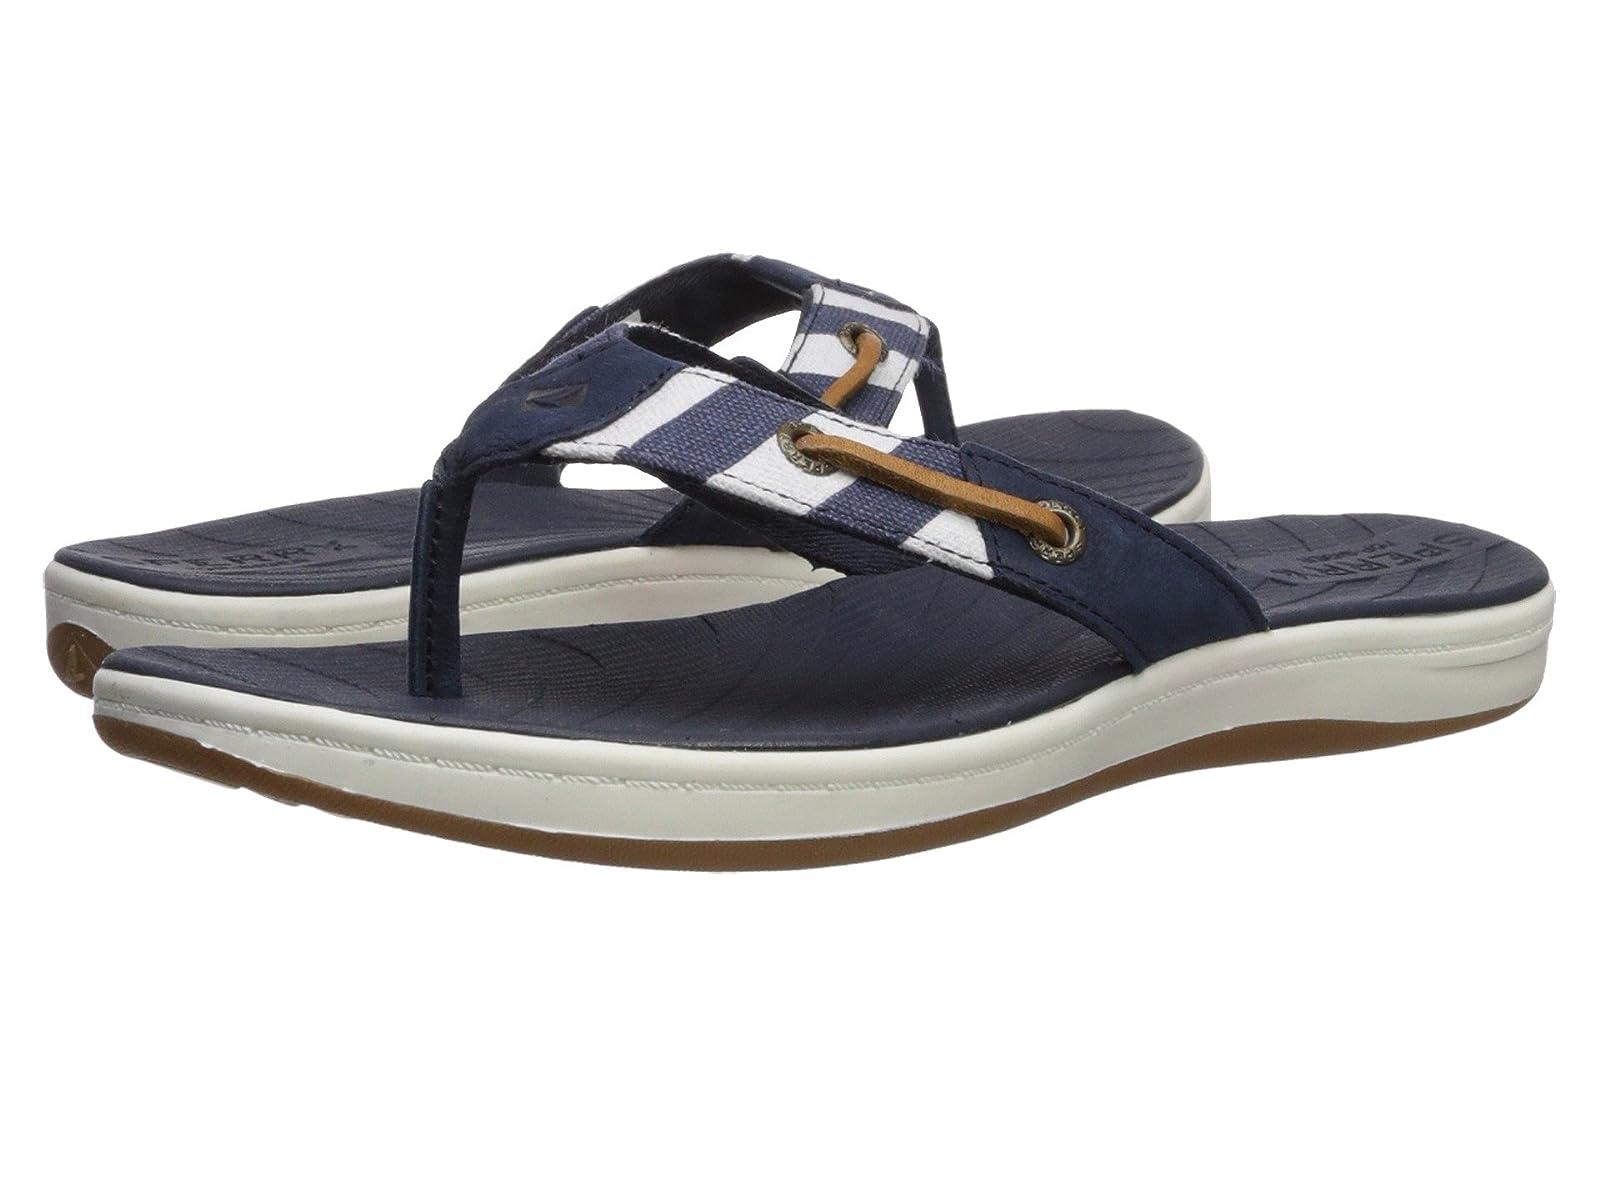 Sperry Seabrook Surf Breton StripeAtmospheric grades have affordable shoes